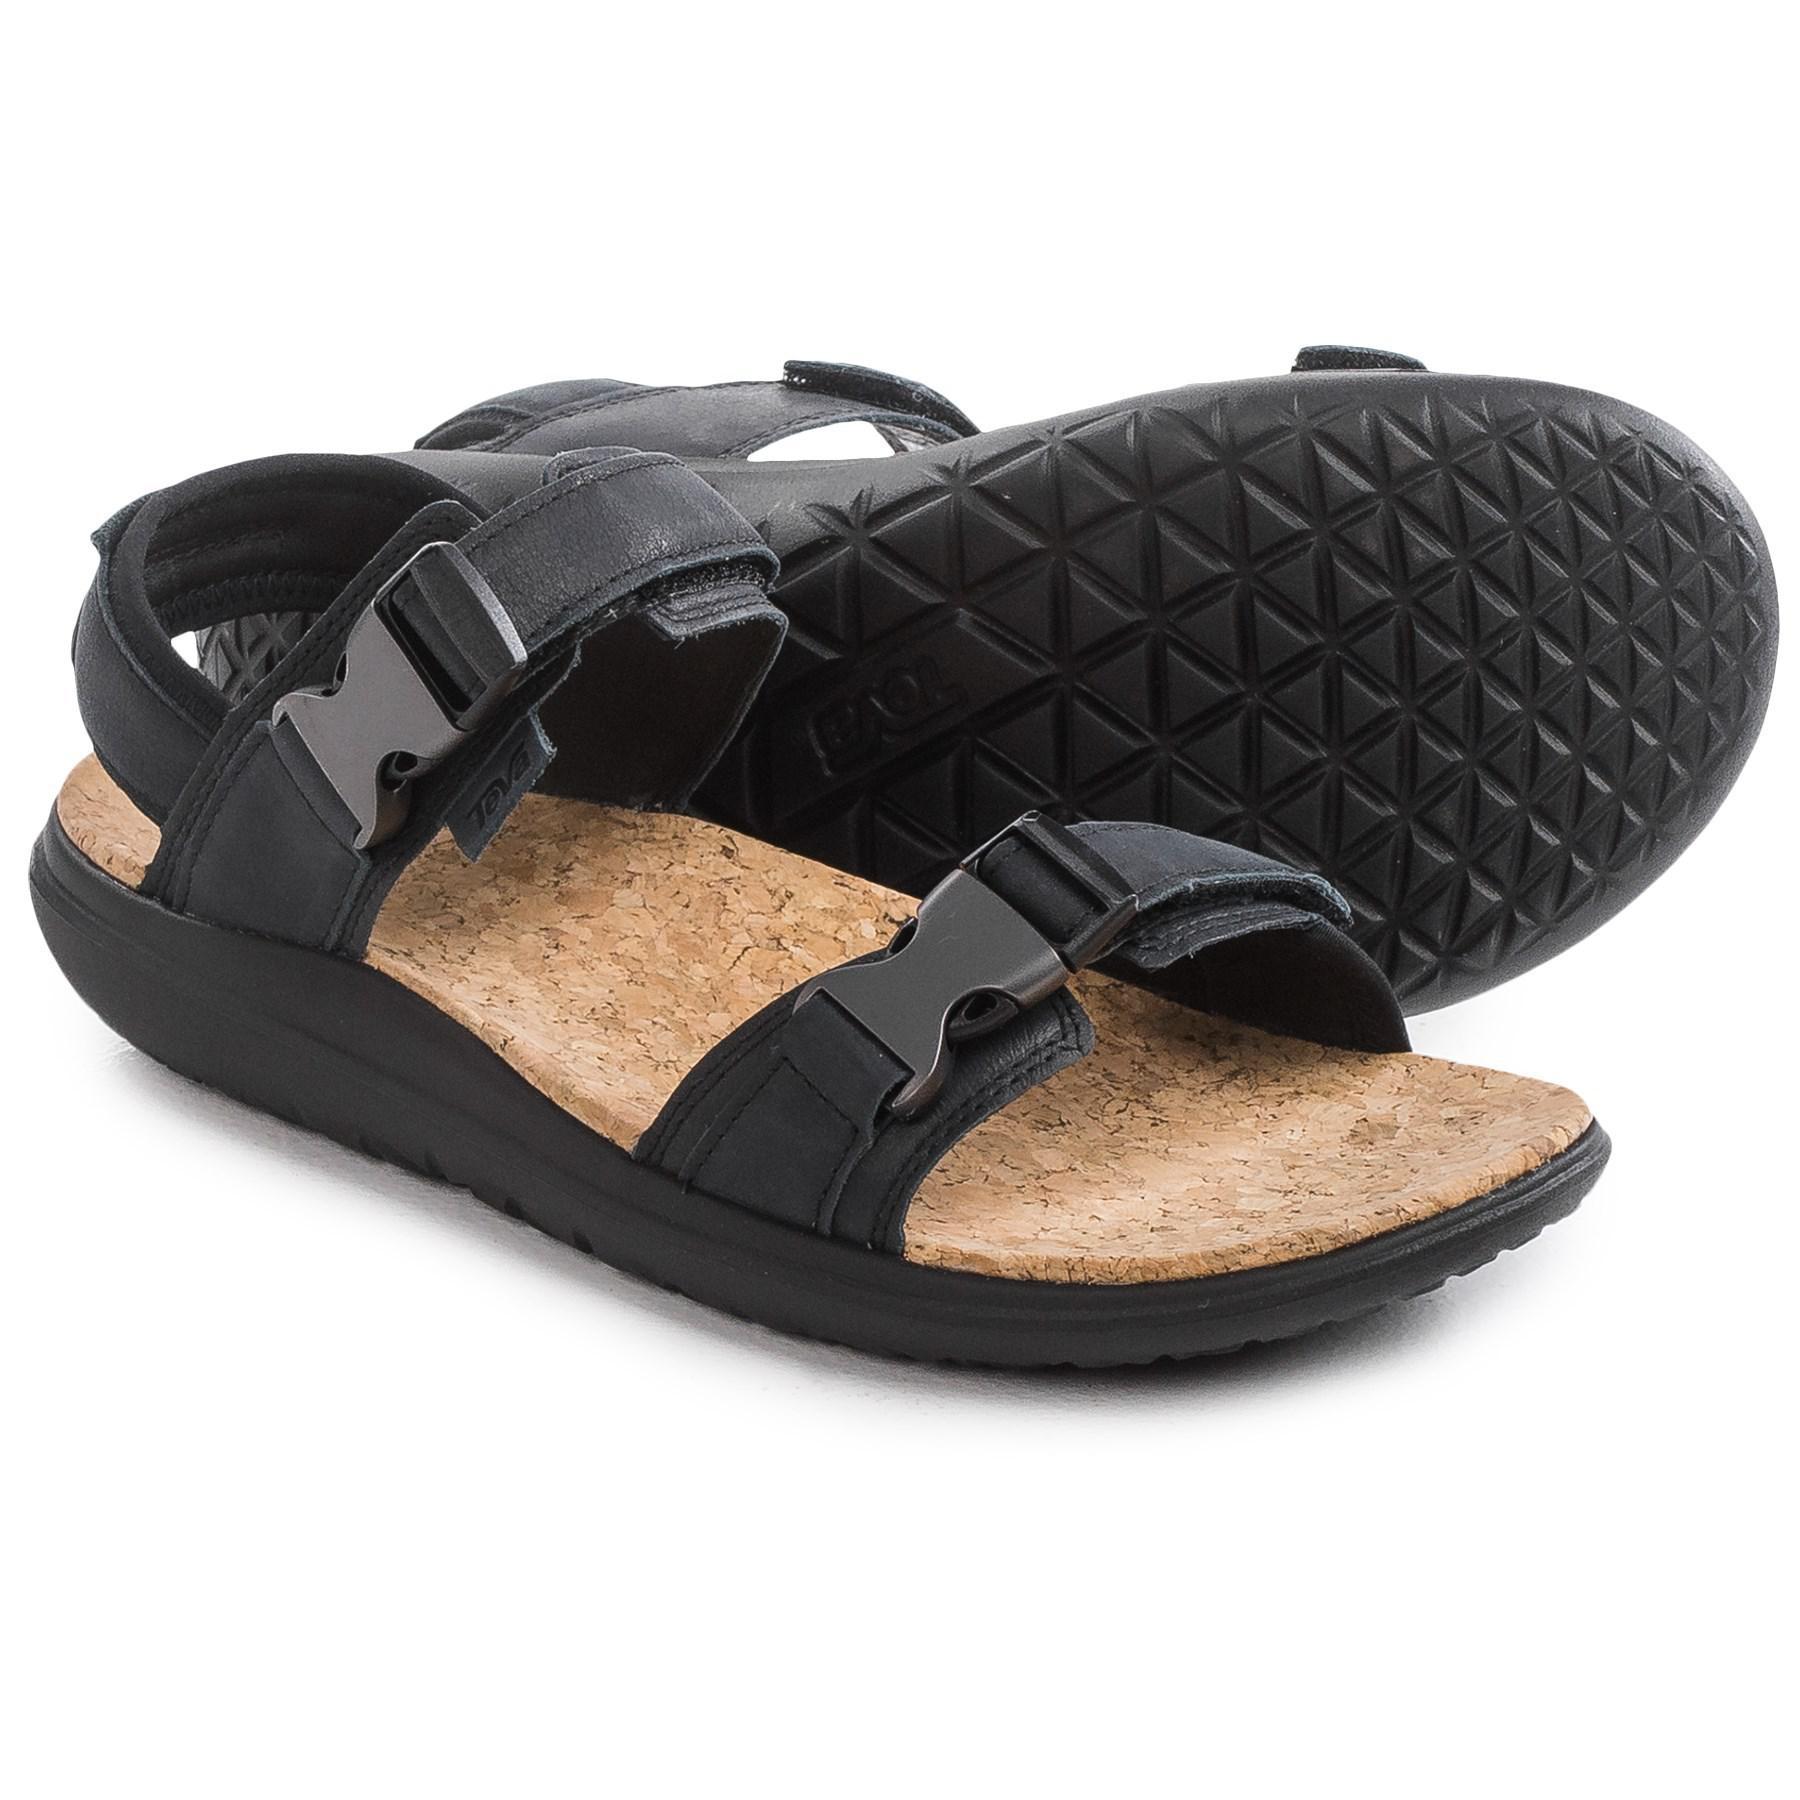 98b958134cf7 Lyst - Teva Terra-float Universal Lux Sport Sandals (for Men) in ...